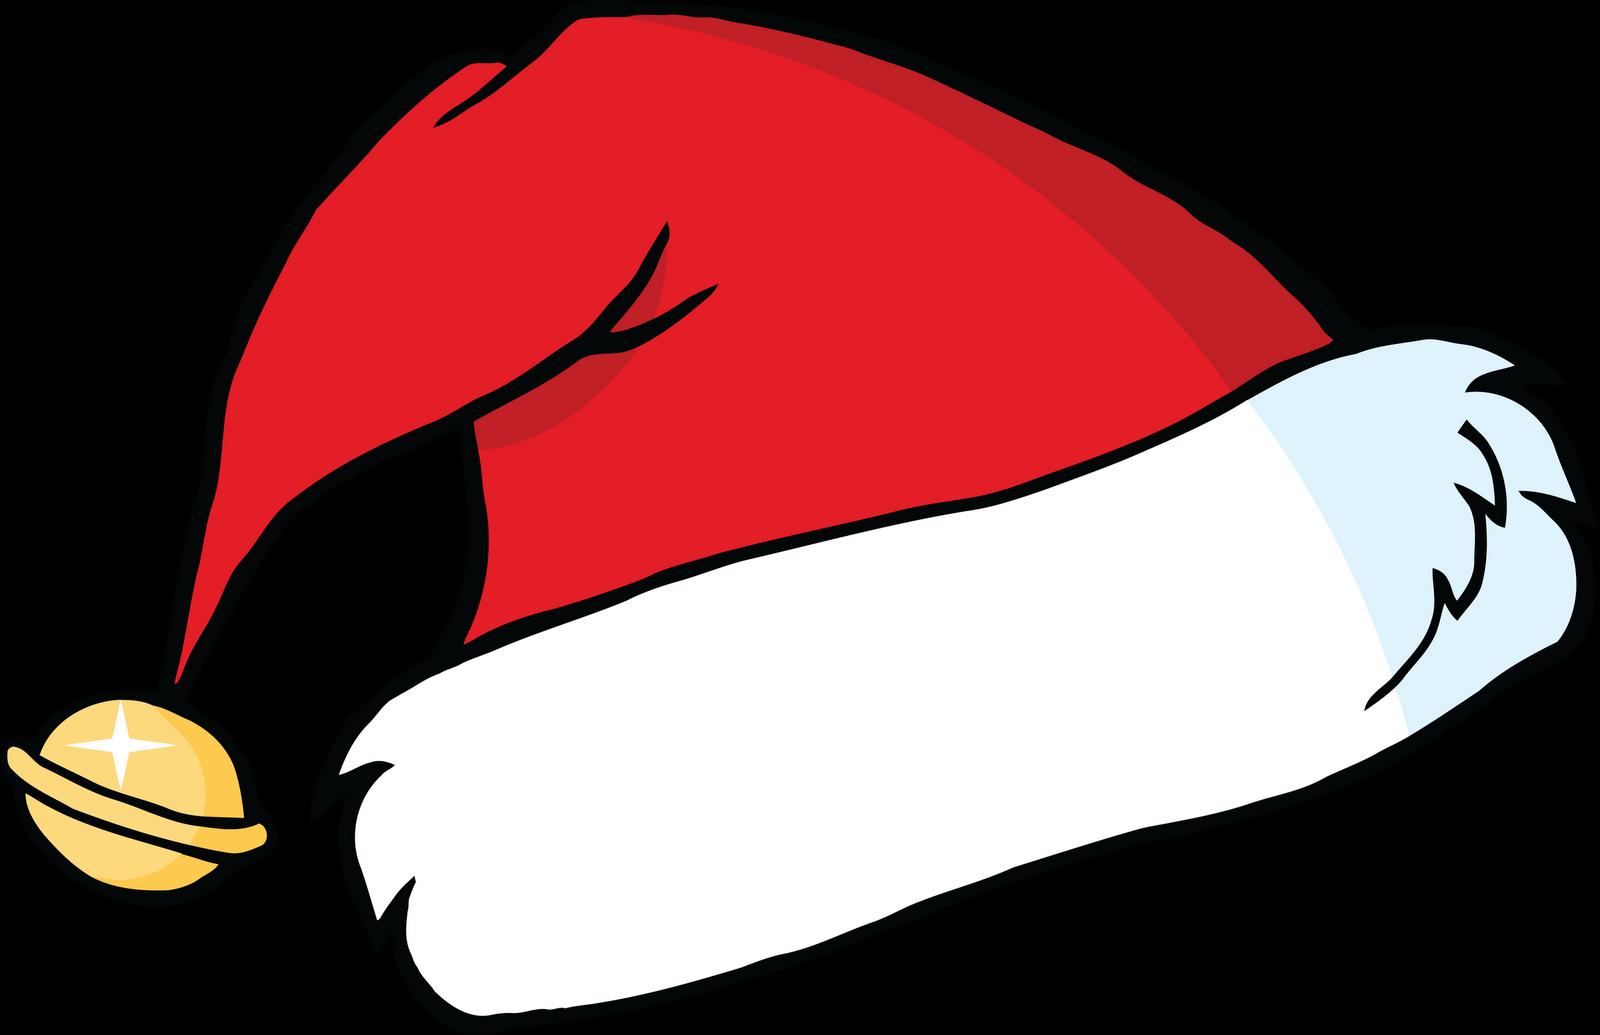 Santa and his reindeer. December clipart golfing